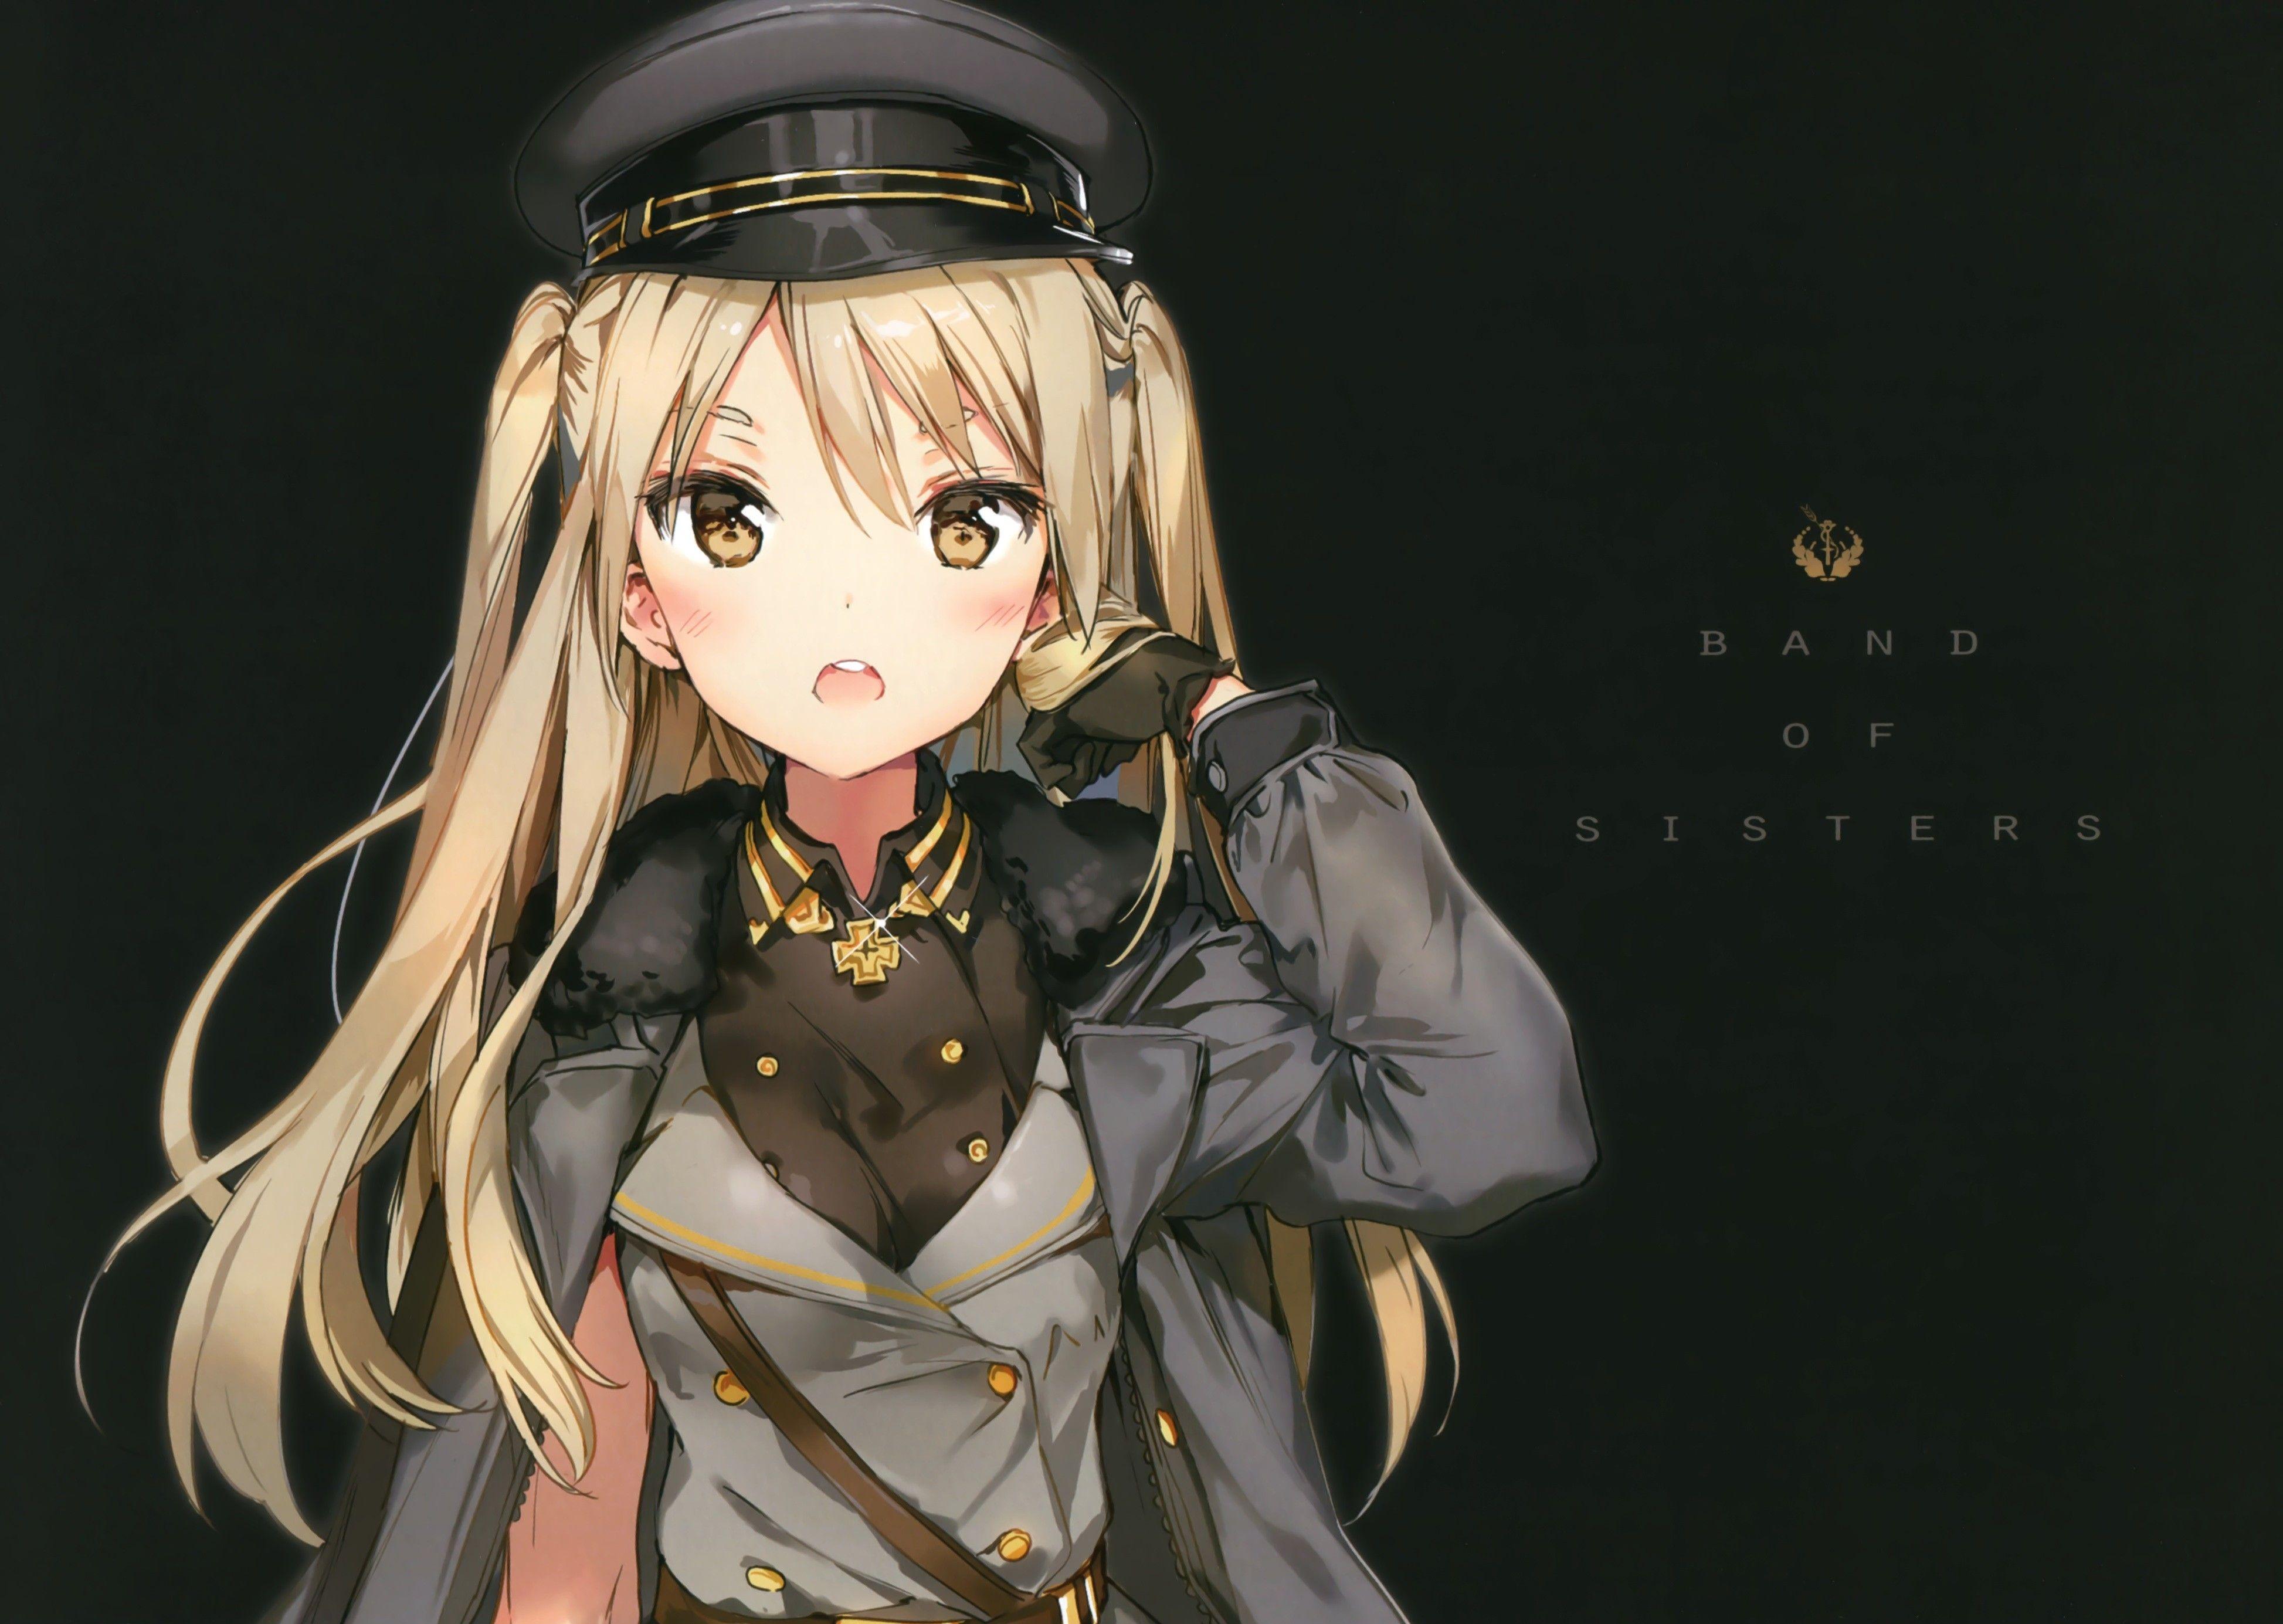 Anime 3893x2769 Anime Anime Girls Uniform Long Hair Blonde Yellow Eyes Ragazza Anime Ragazze Anime Anime